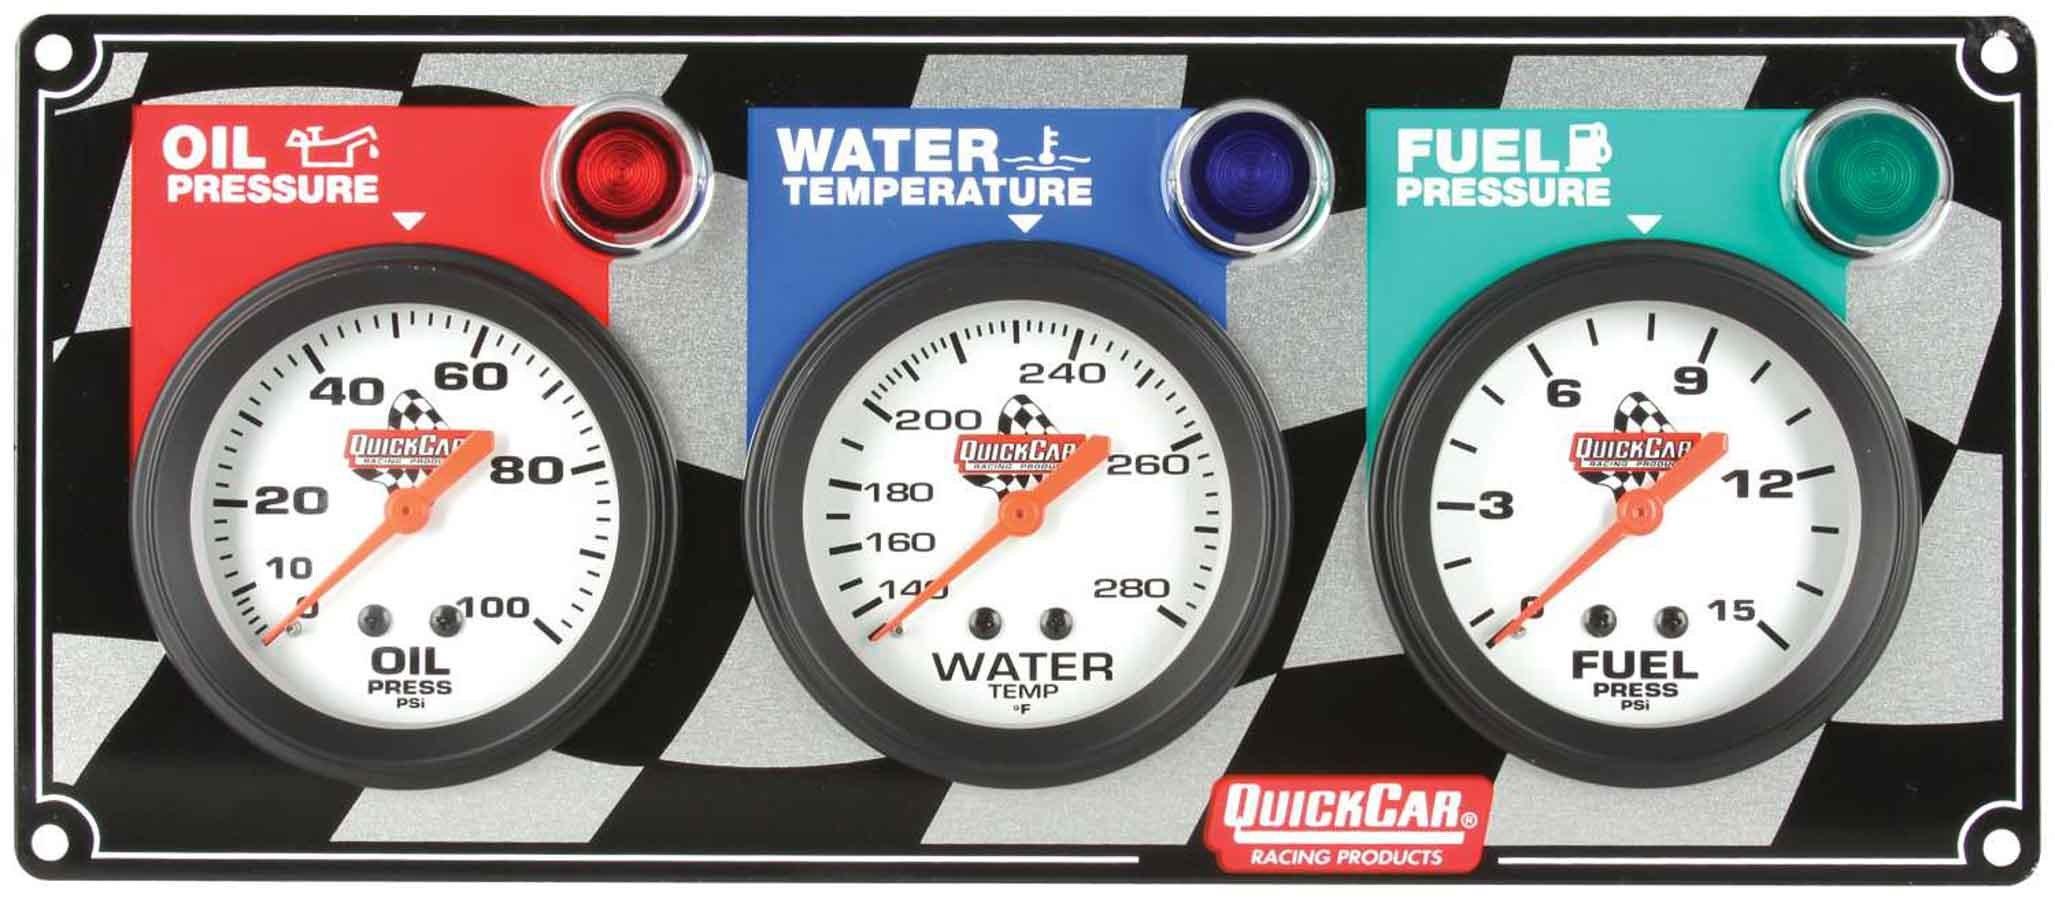 Quickcar Racing Products 3 Gauge Panel OP/WT/FP